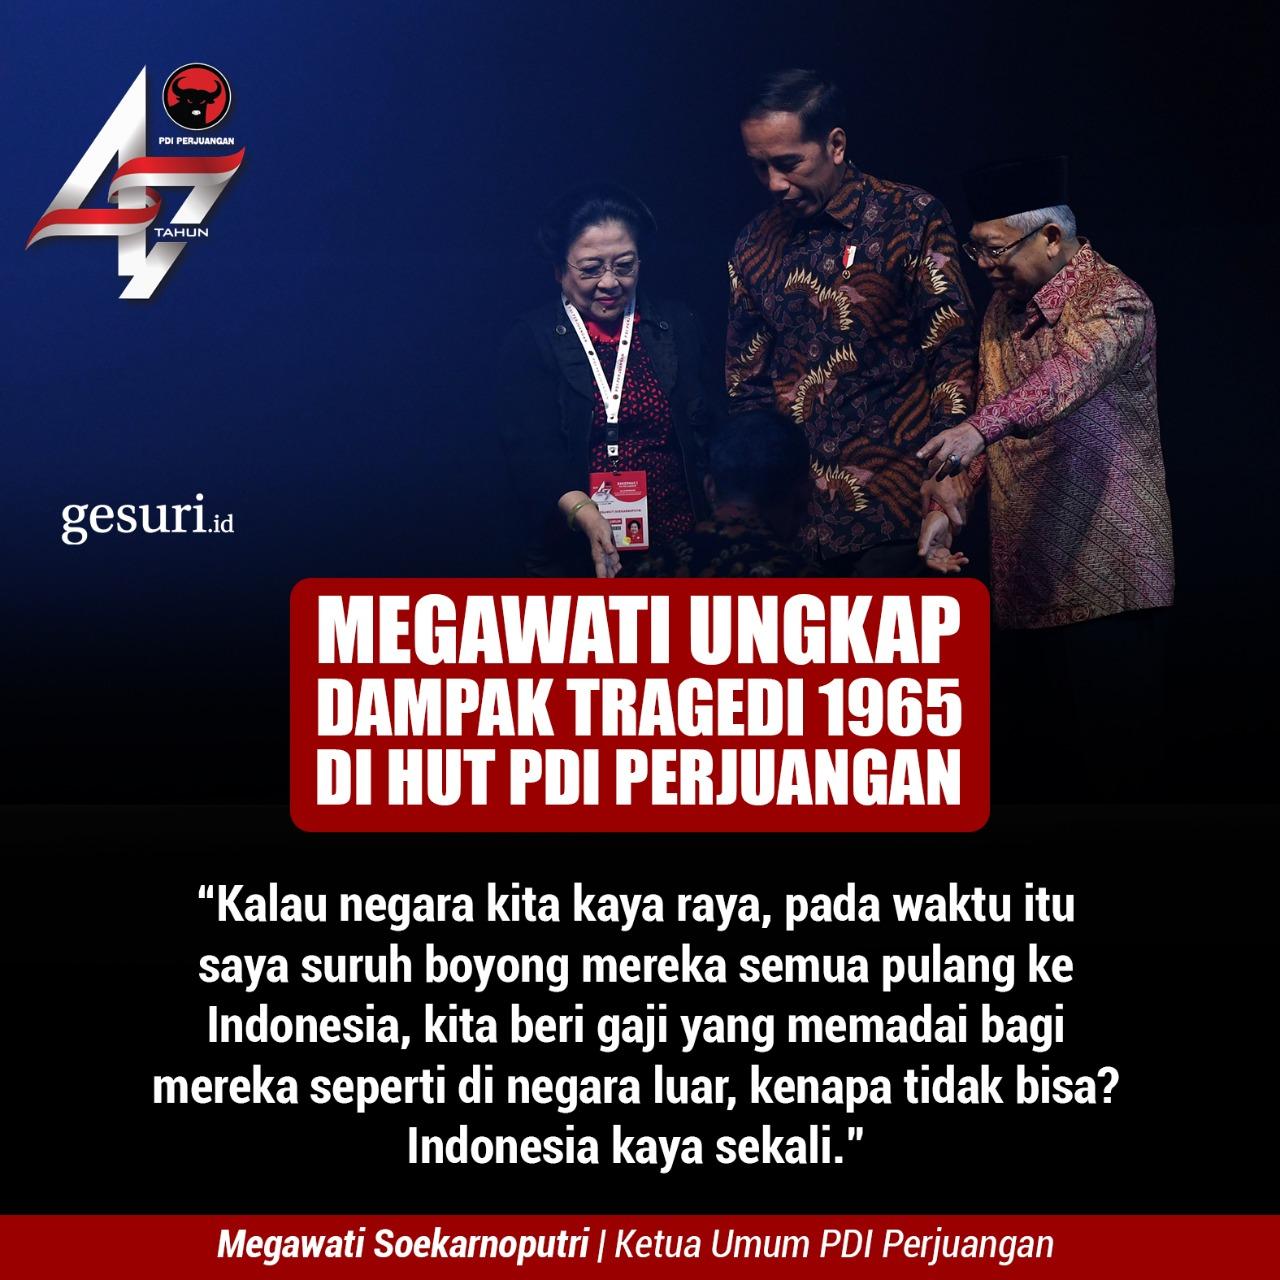 Megawati Ungkap Dampak Tragedi 1965 di HUT PDI Perjuangan